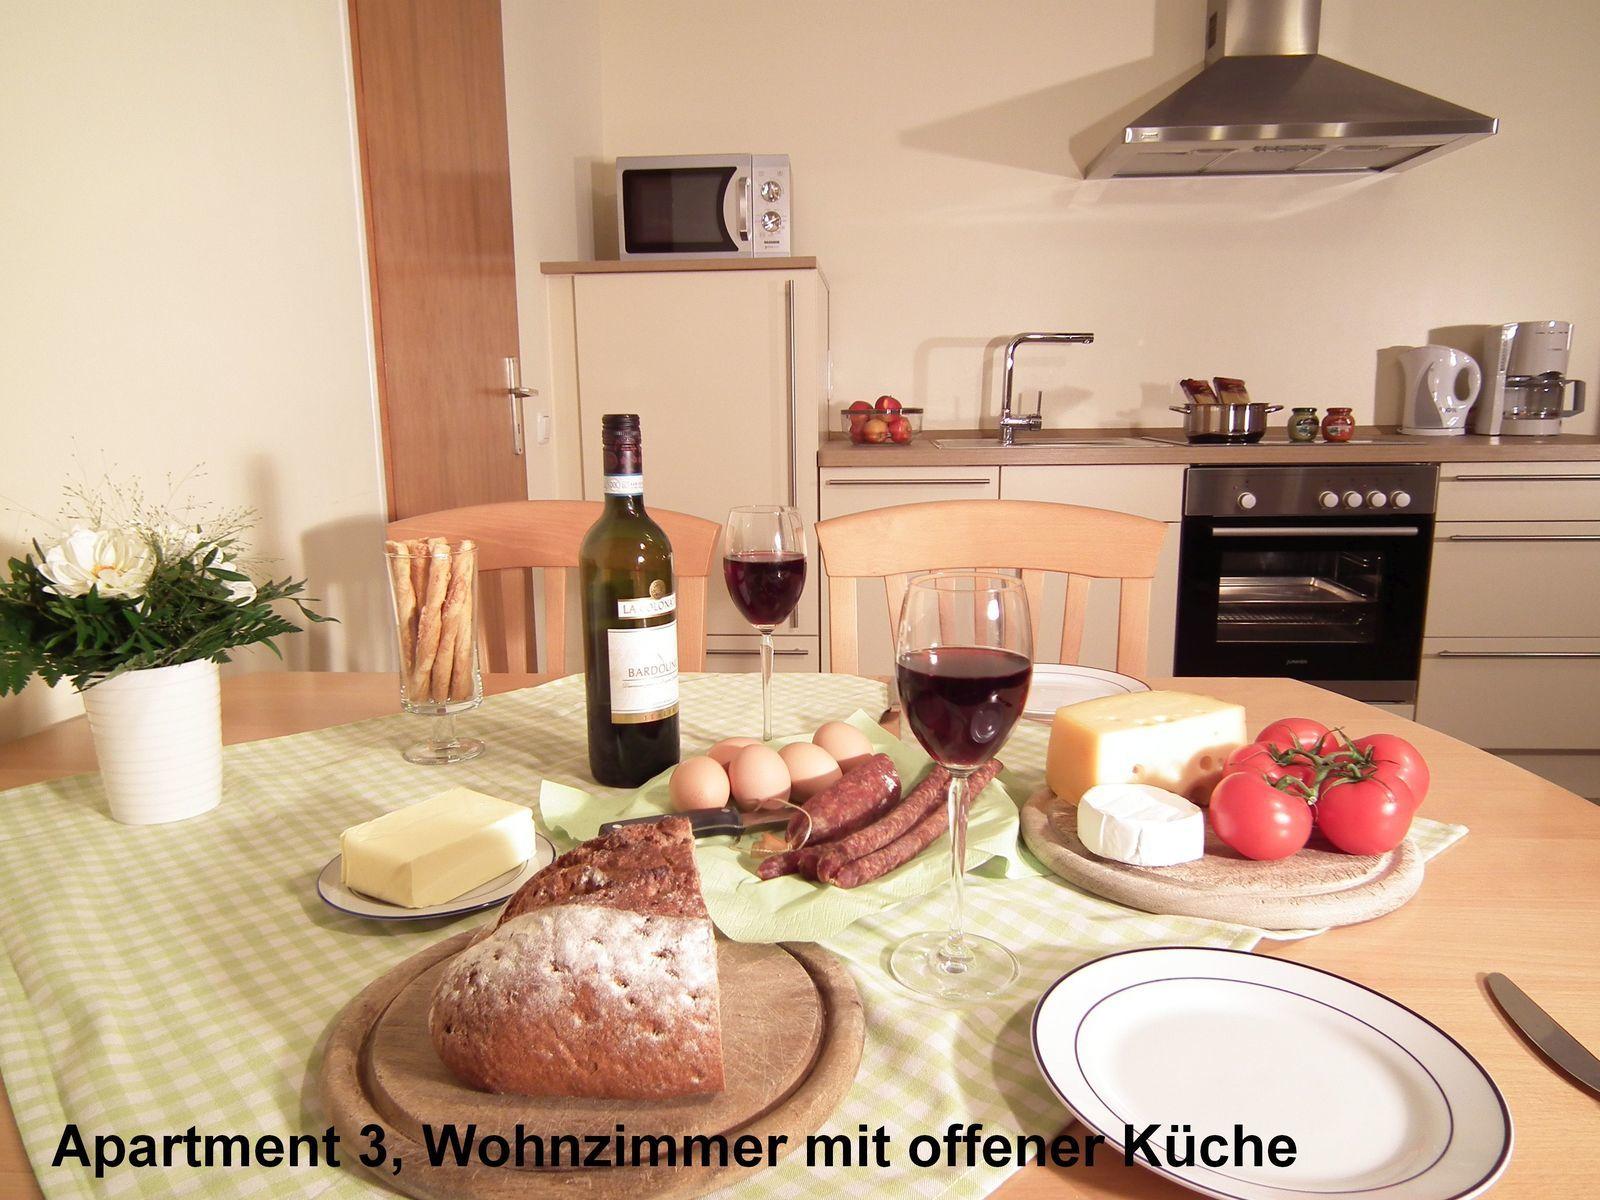 Appartement - Haus Merian 3 | Winterberg